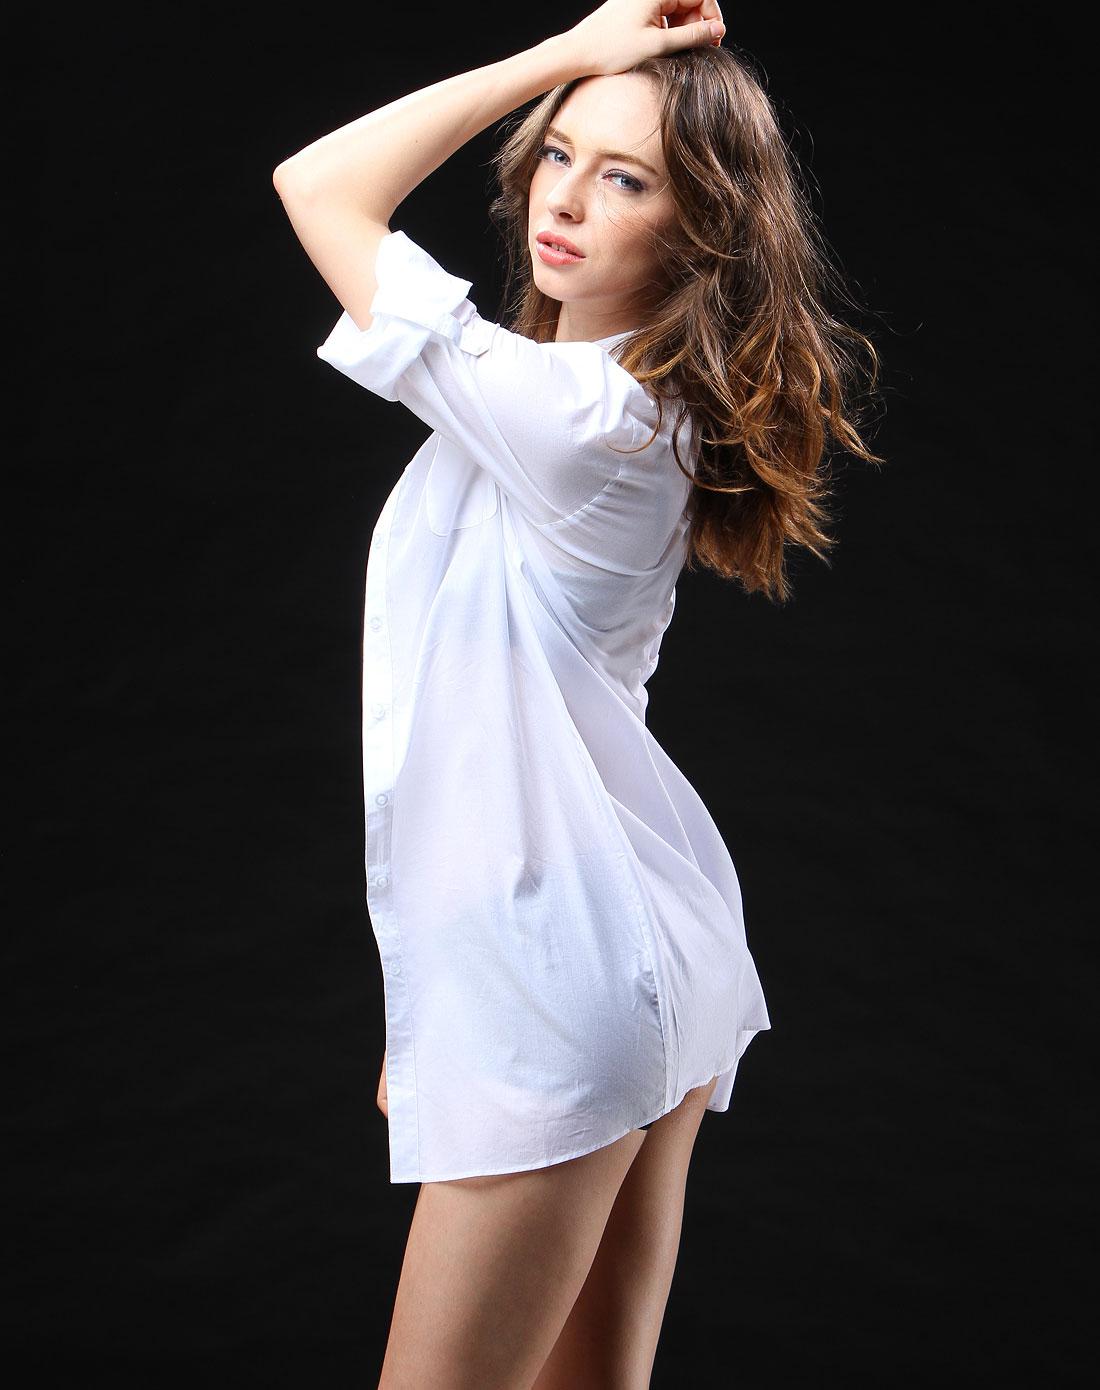 love女士内衣专场白色休闲长款中袖衬衫